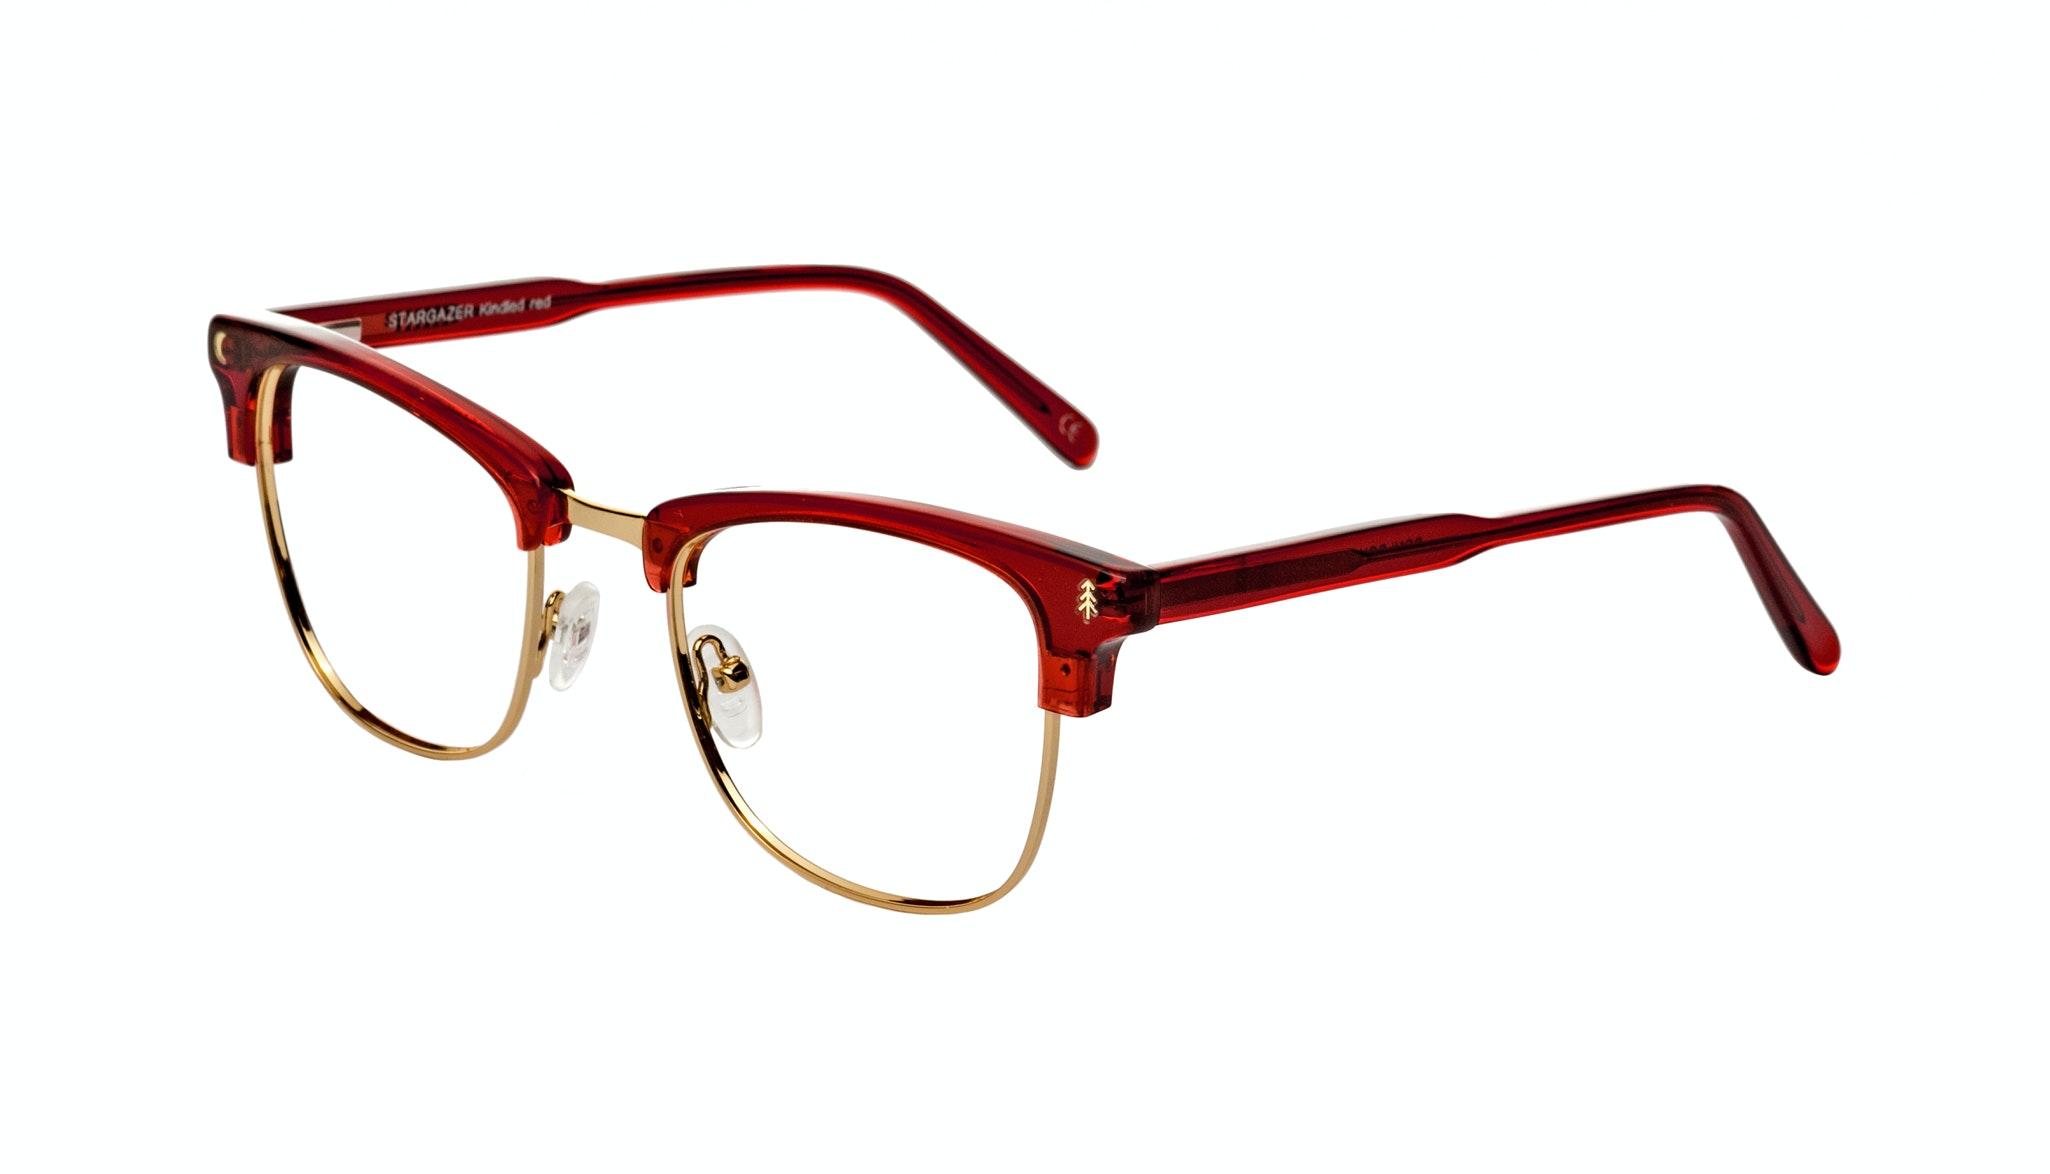 Affordable Fashion Glasses Rectangle Eyeglasses Women Stargazer Kindled Red Tilt